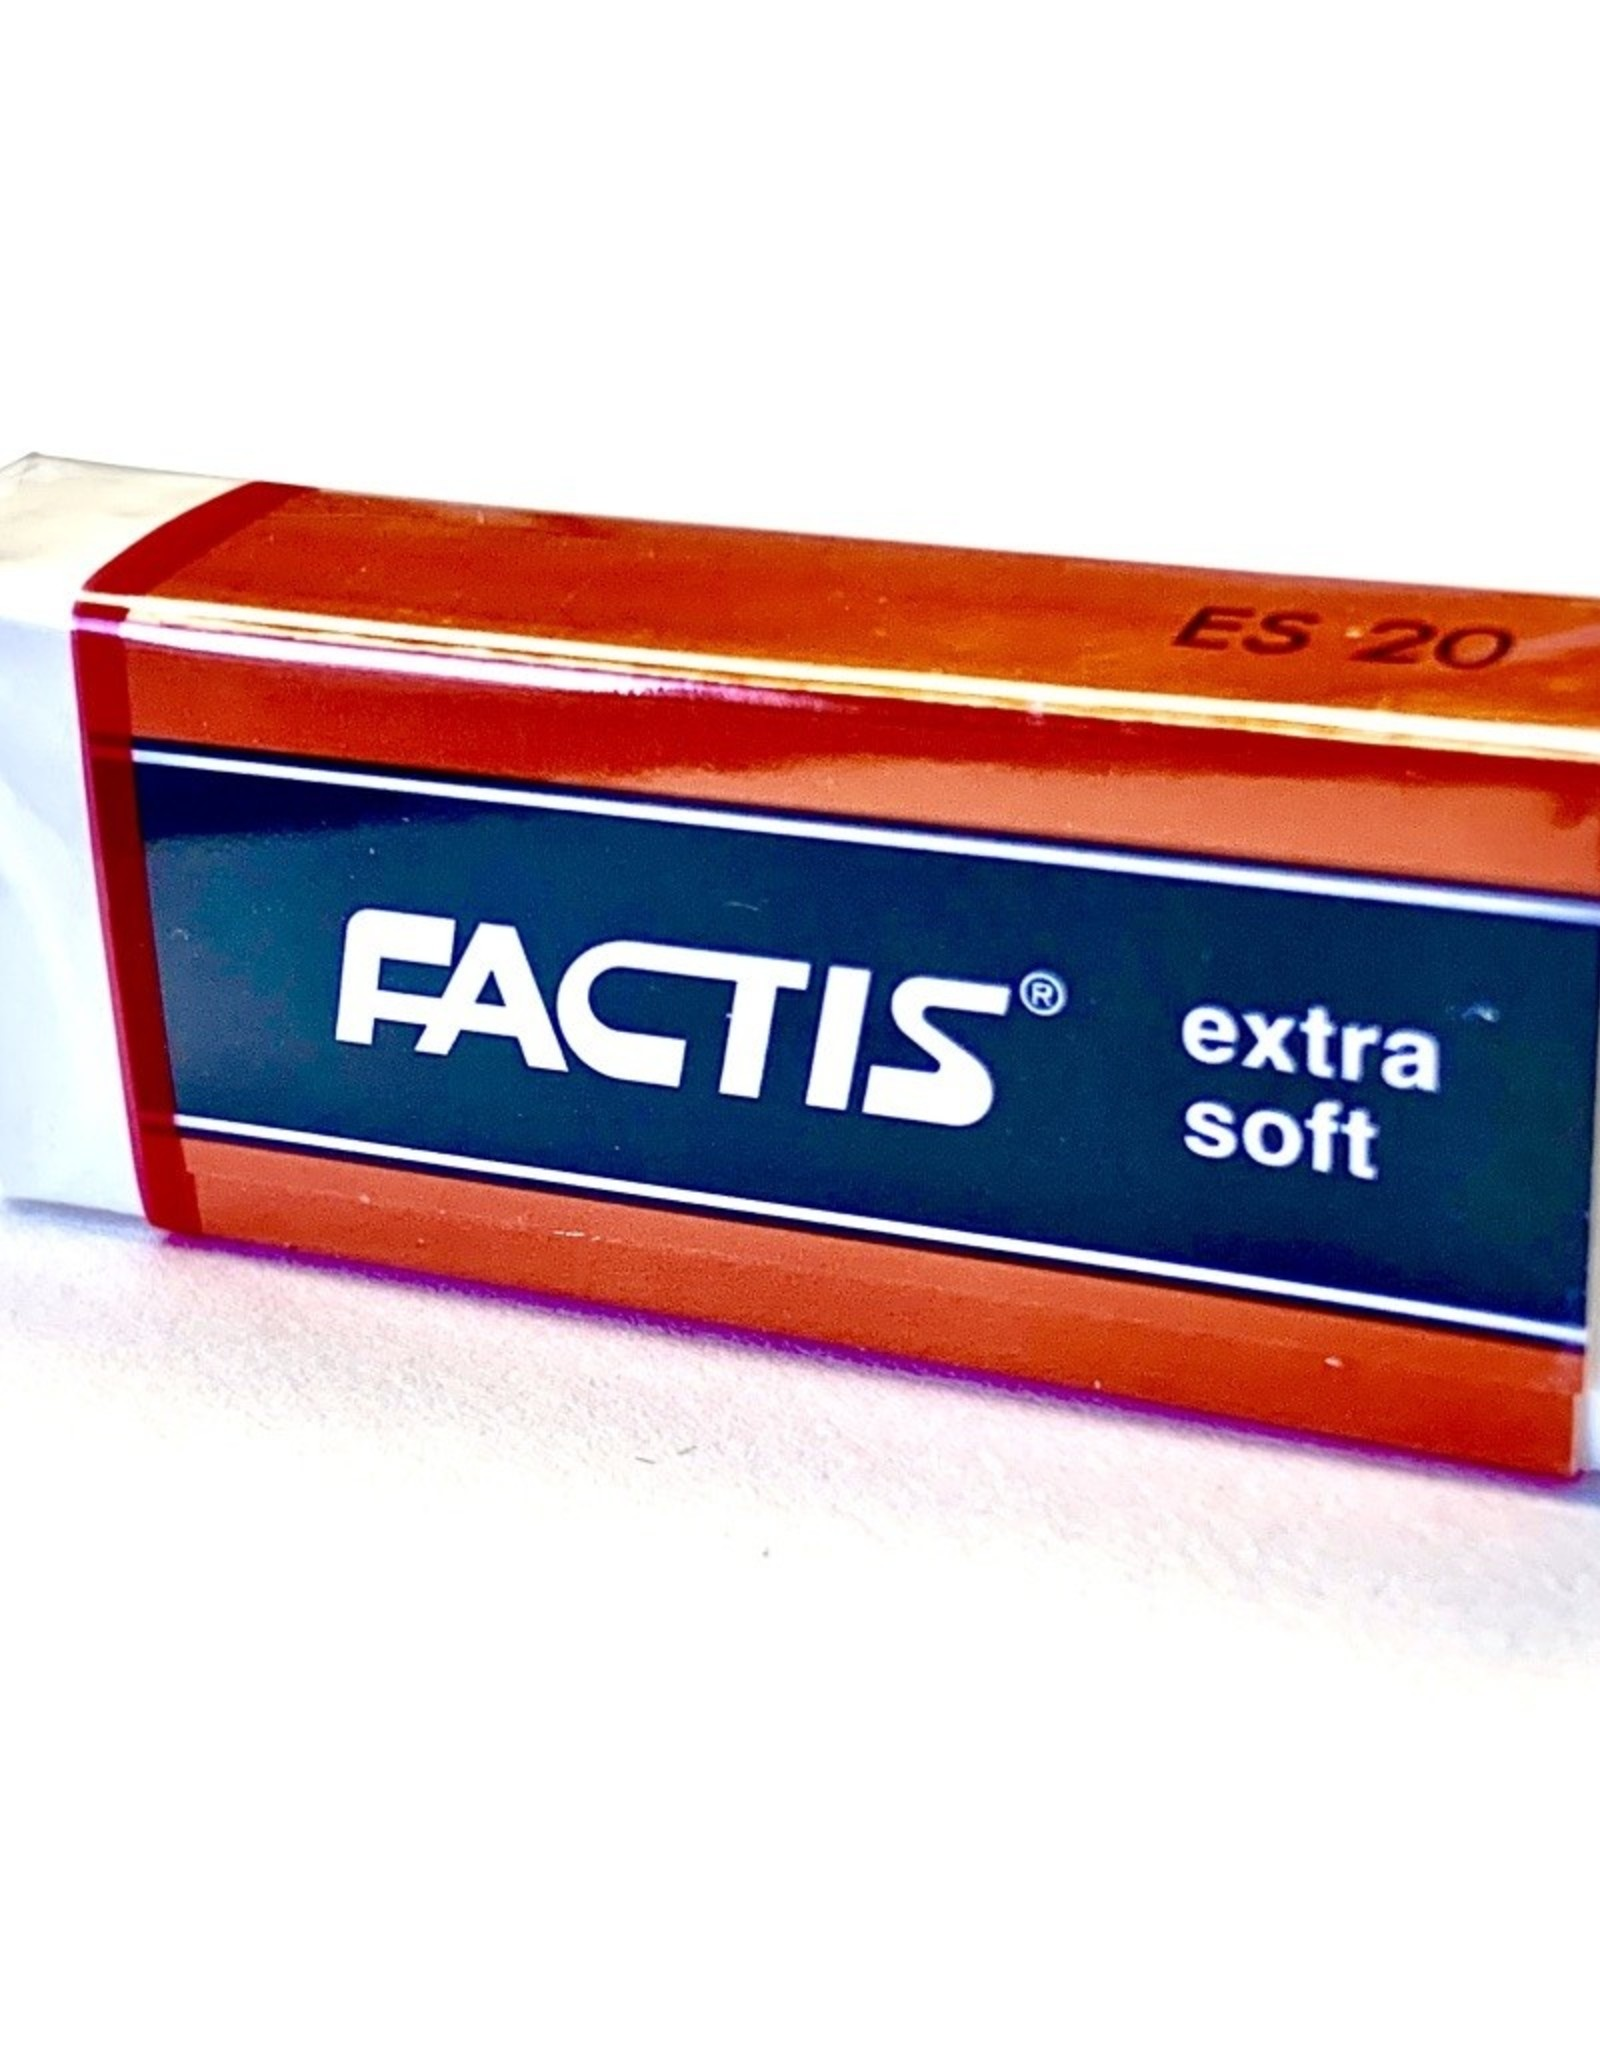 Factis White Vinyl Eraser, Extra Soft